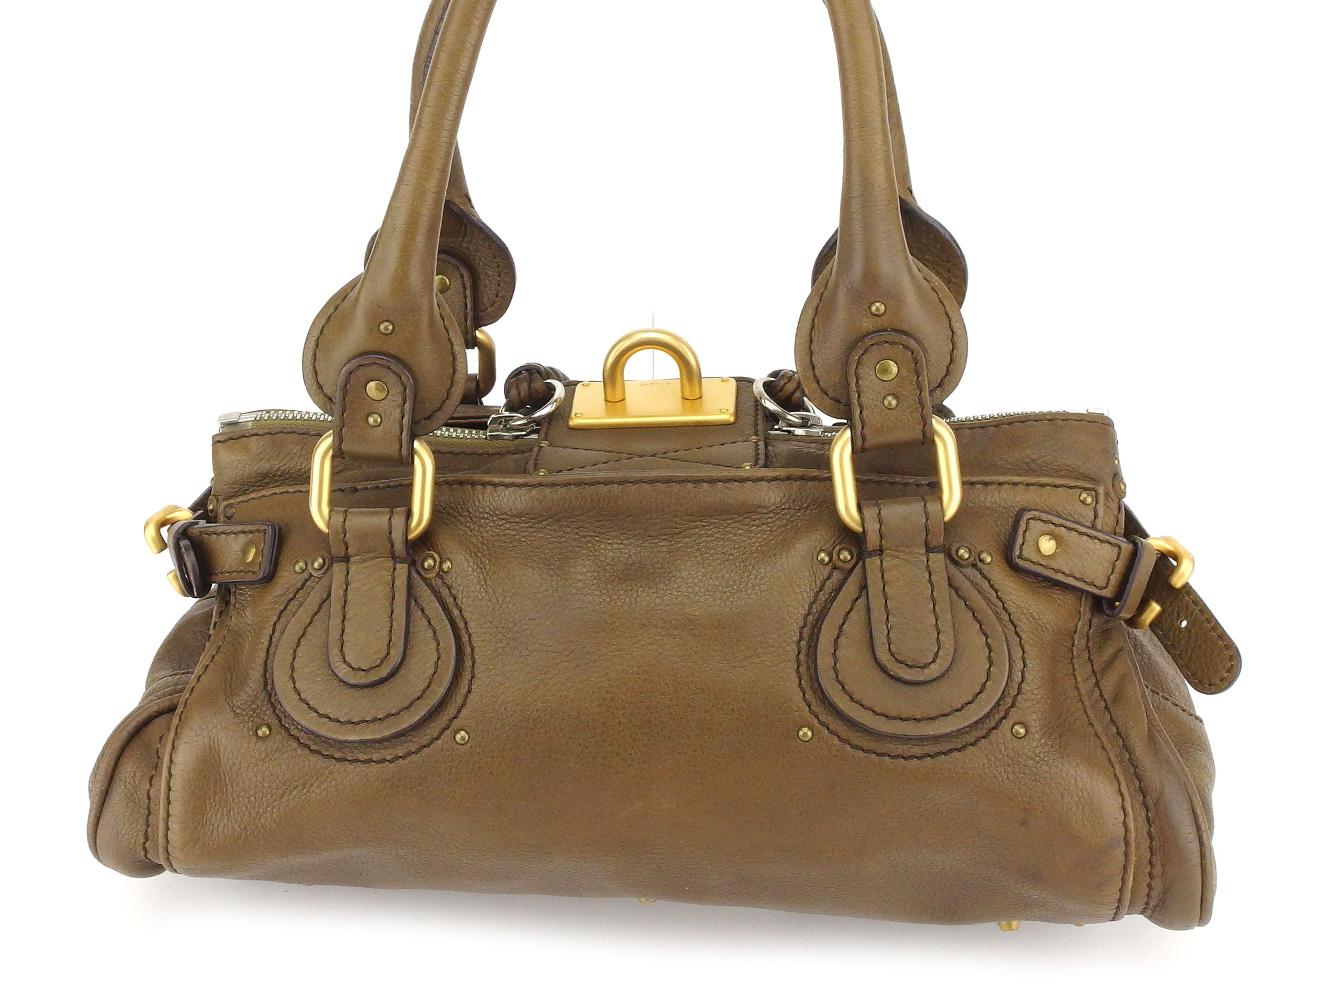 Kuroe Chloe shoulder bag mini-Boston bag Lady s brown leather popularity  sale C3163 d191992addf0b